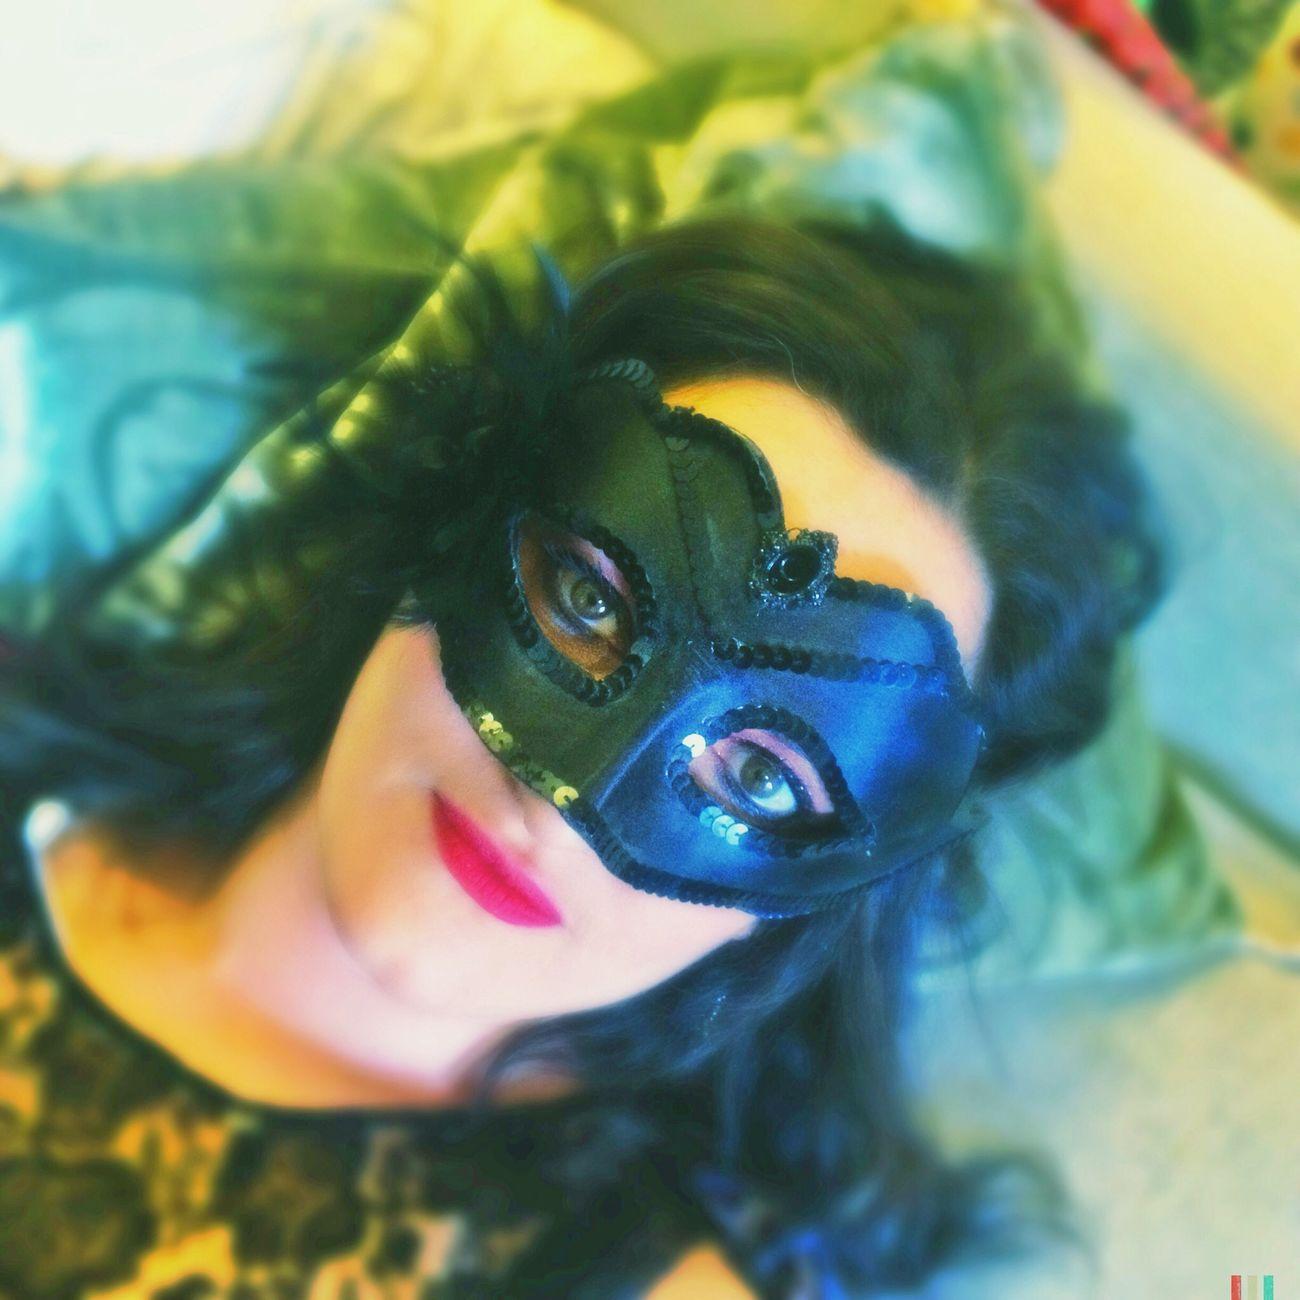 Masked I advance... NEM Self AMPt Community Shootermag NEM Submissions